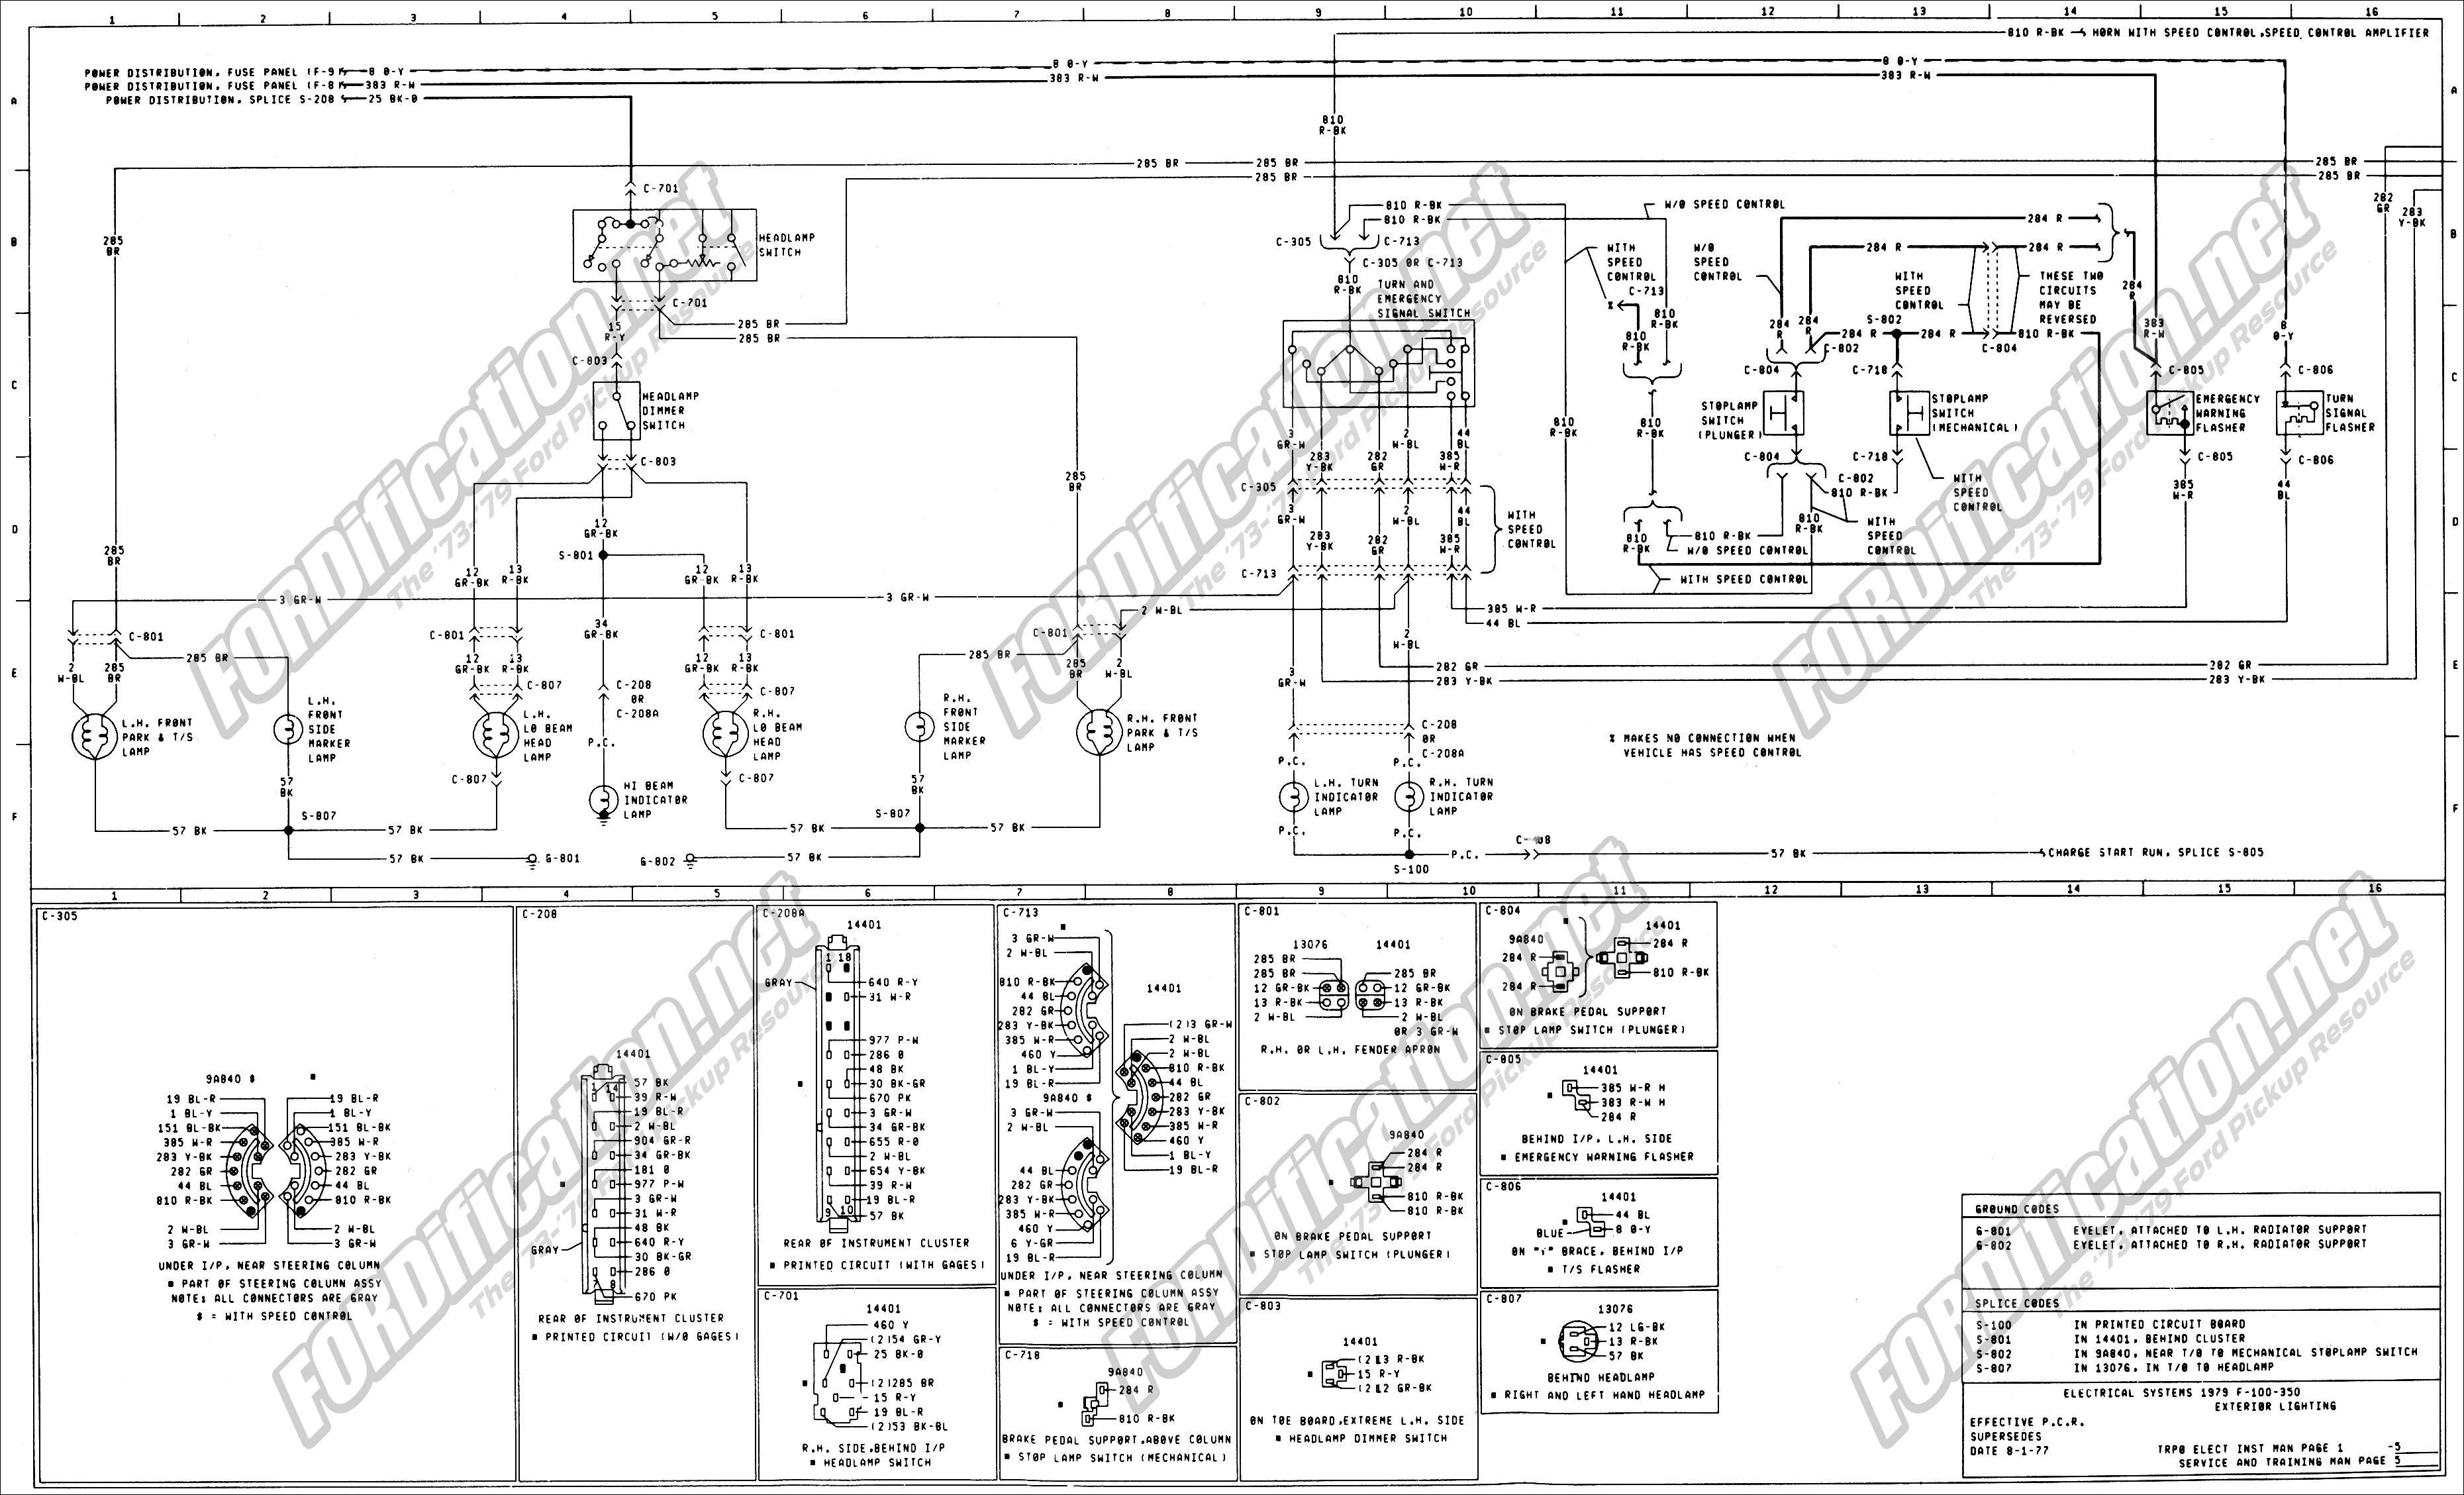 2011 ford F150 Radio Wiring Diagram 1973 1979 ford Truck Wiring Diagrams & Schematics fordification Of 2011 ford F150 Radio Wiring Diagram